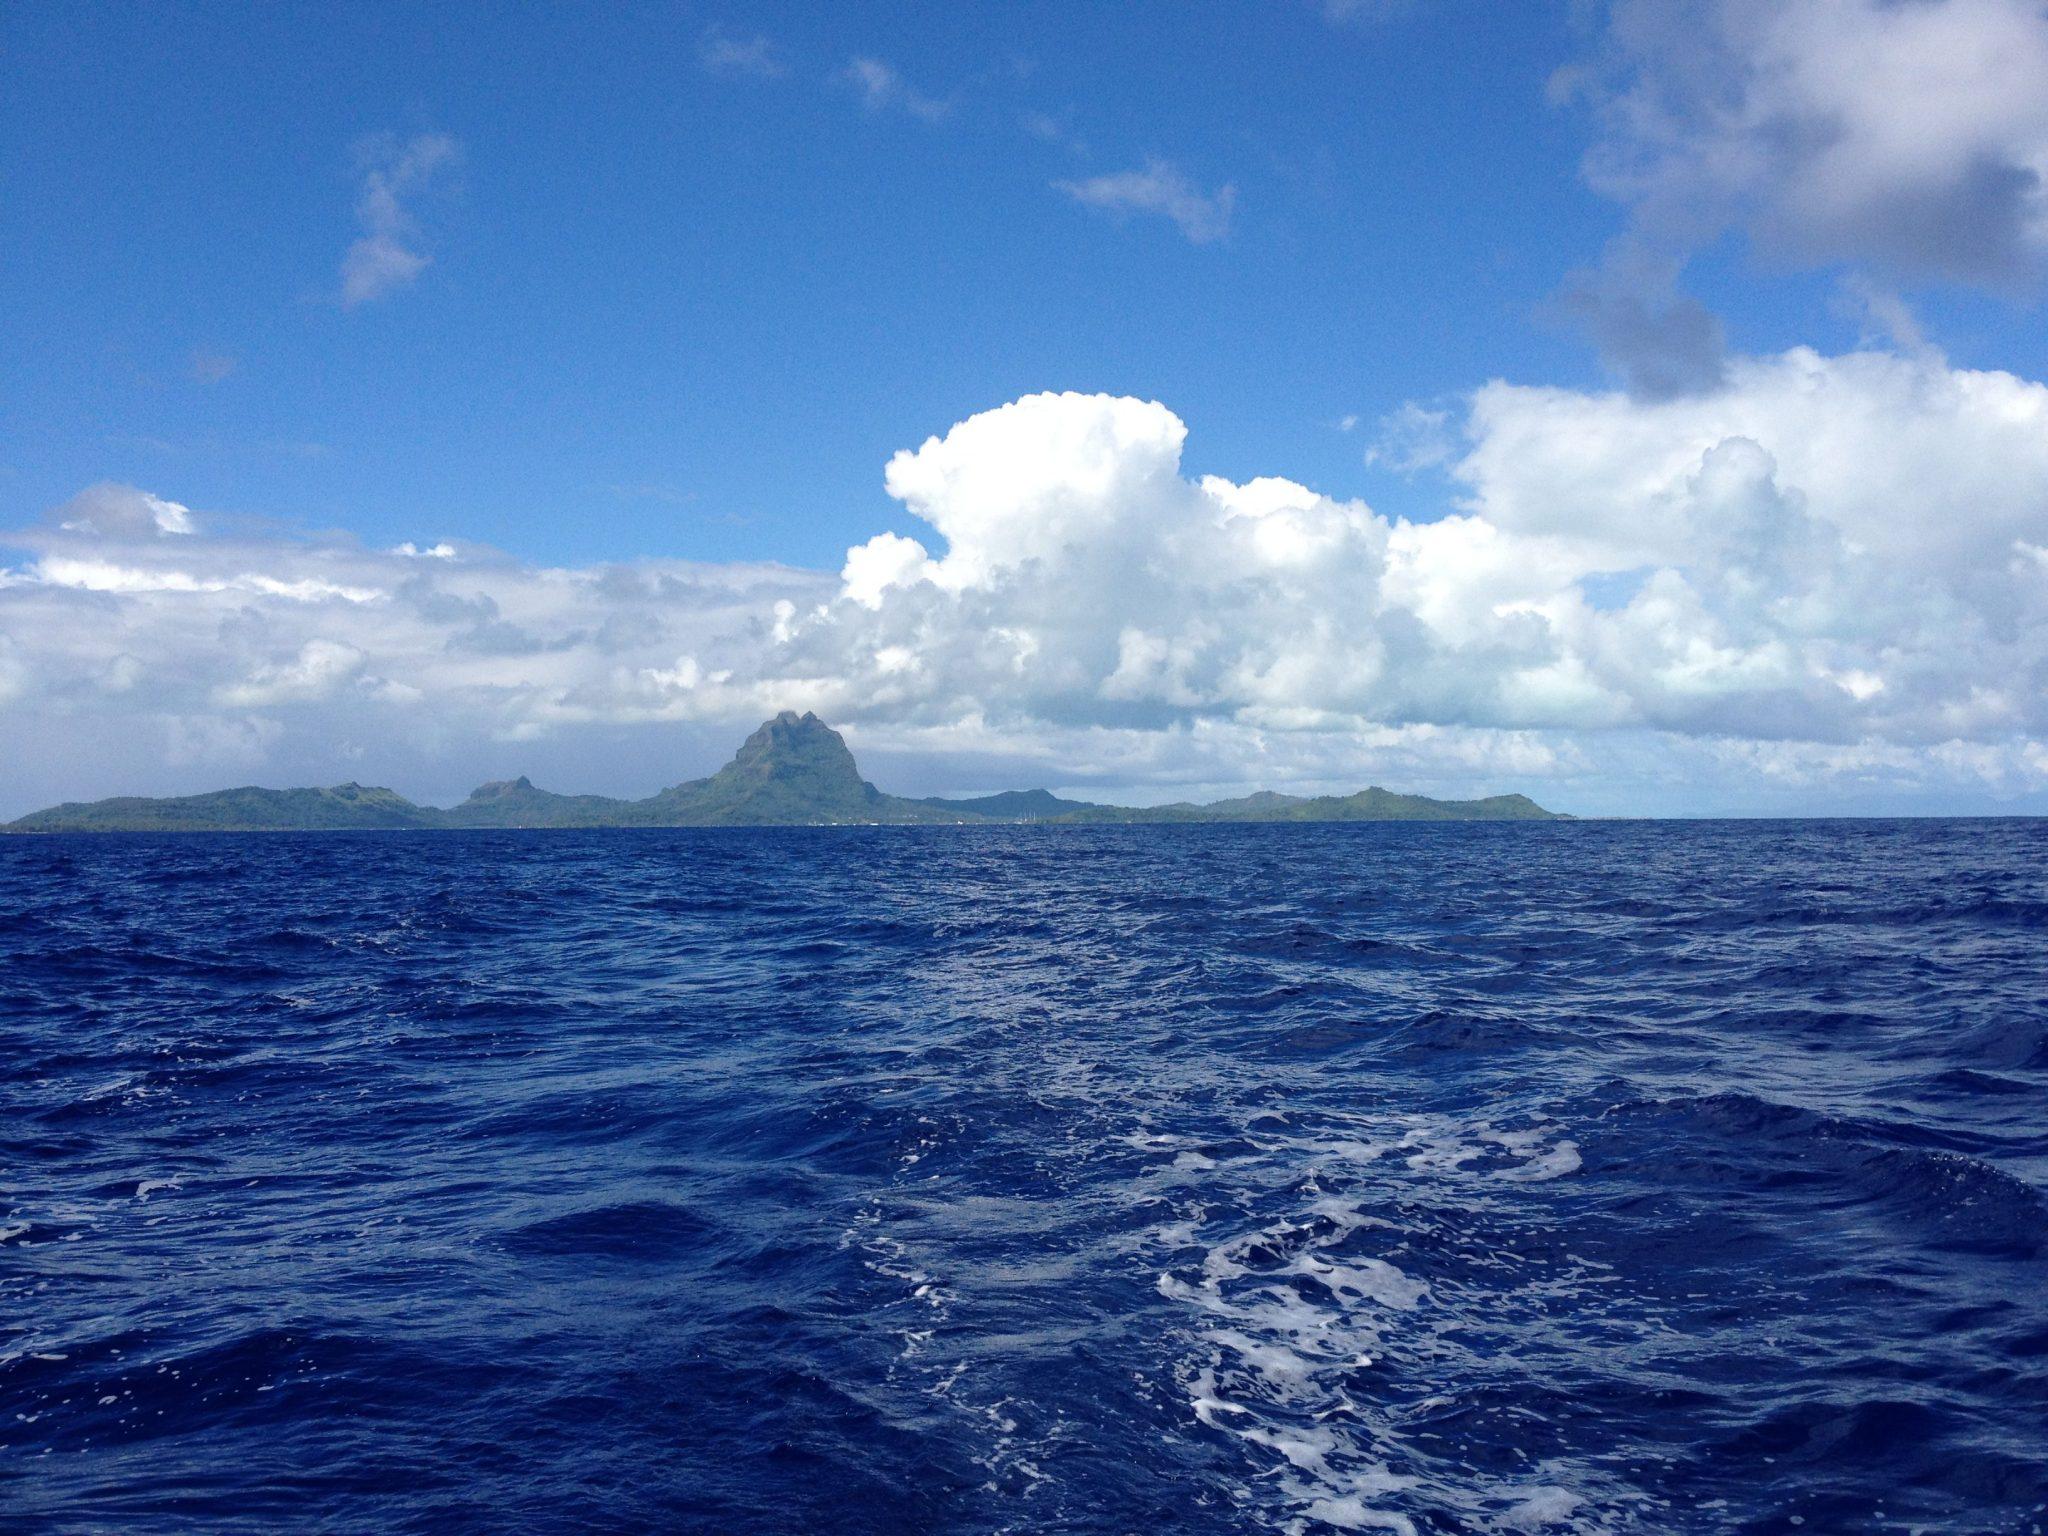 63. Fairwell Bora Bora!  We love you! We left Joyful's wake and good new friends behind